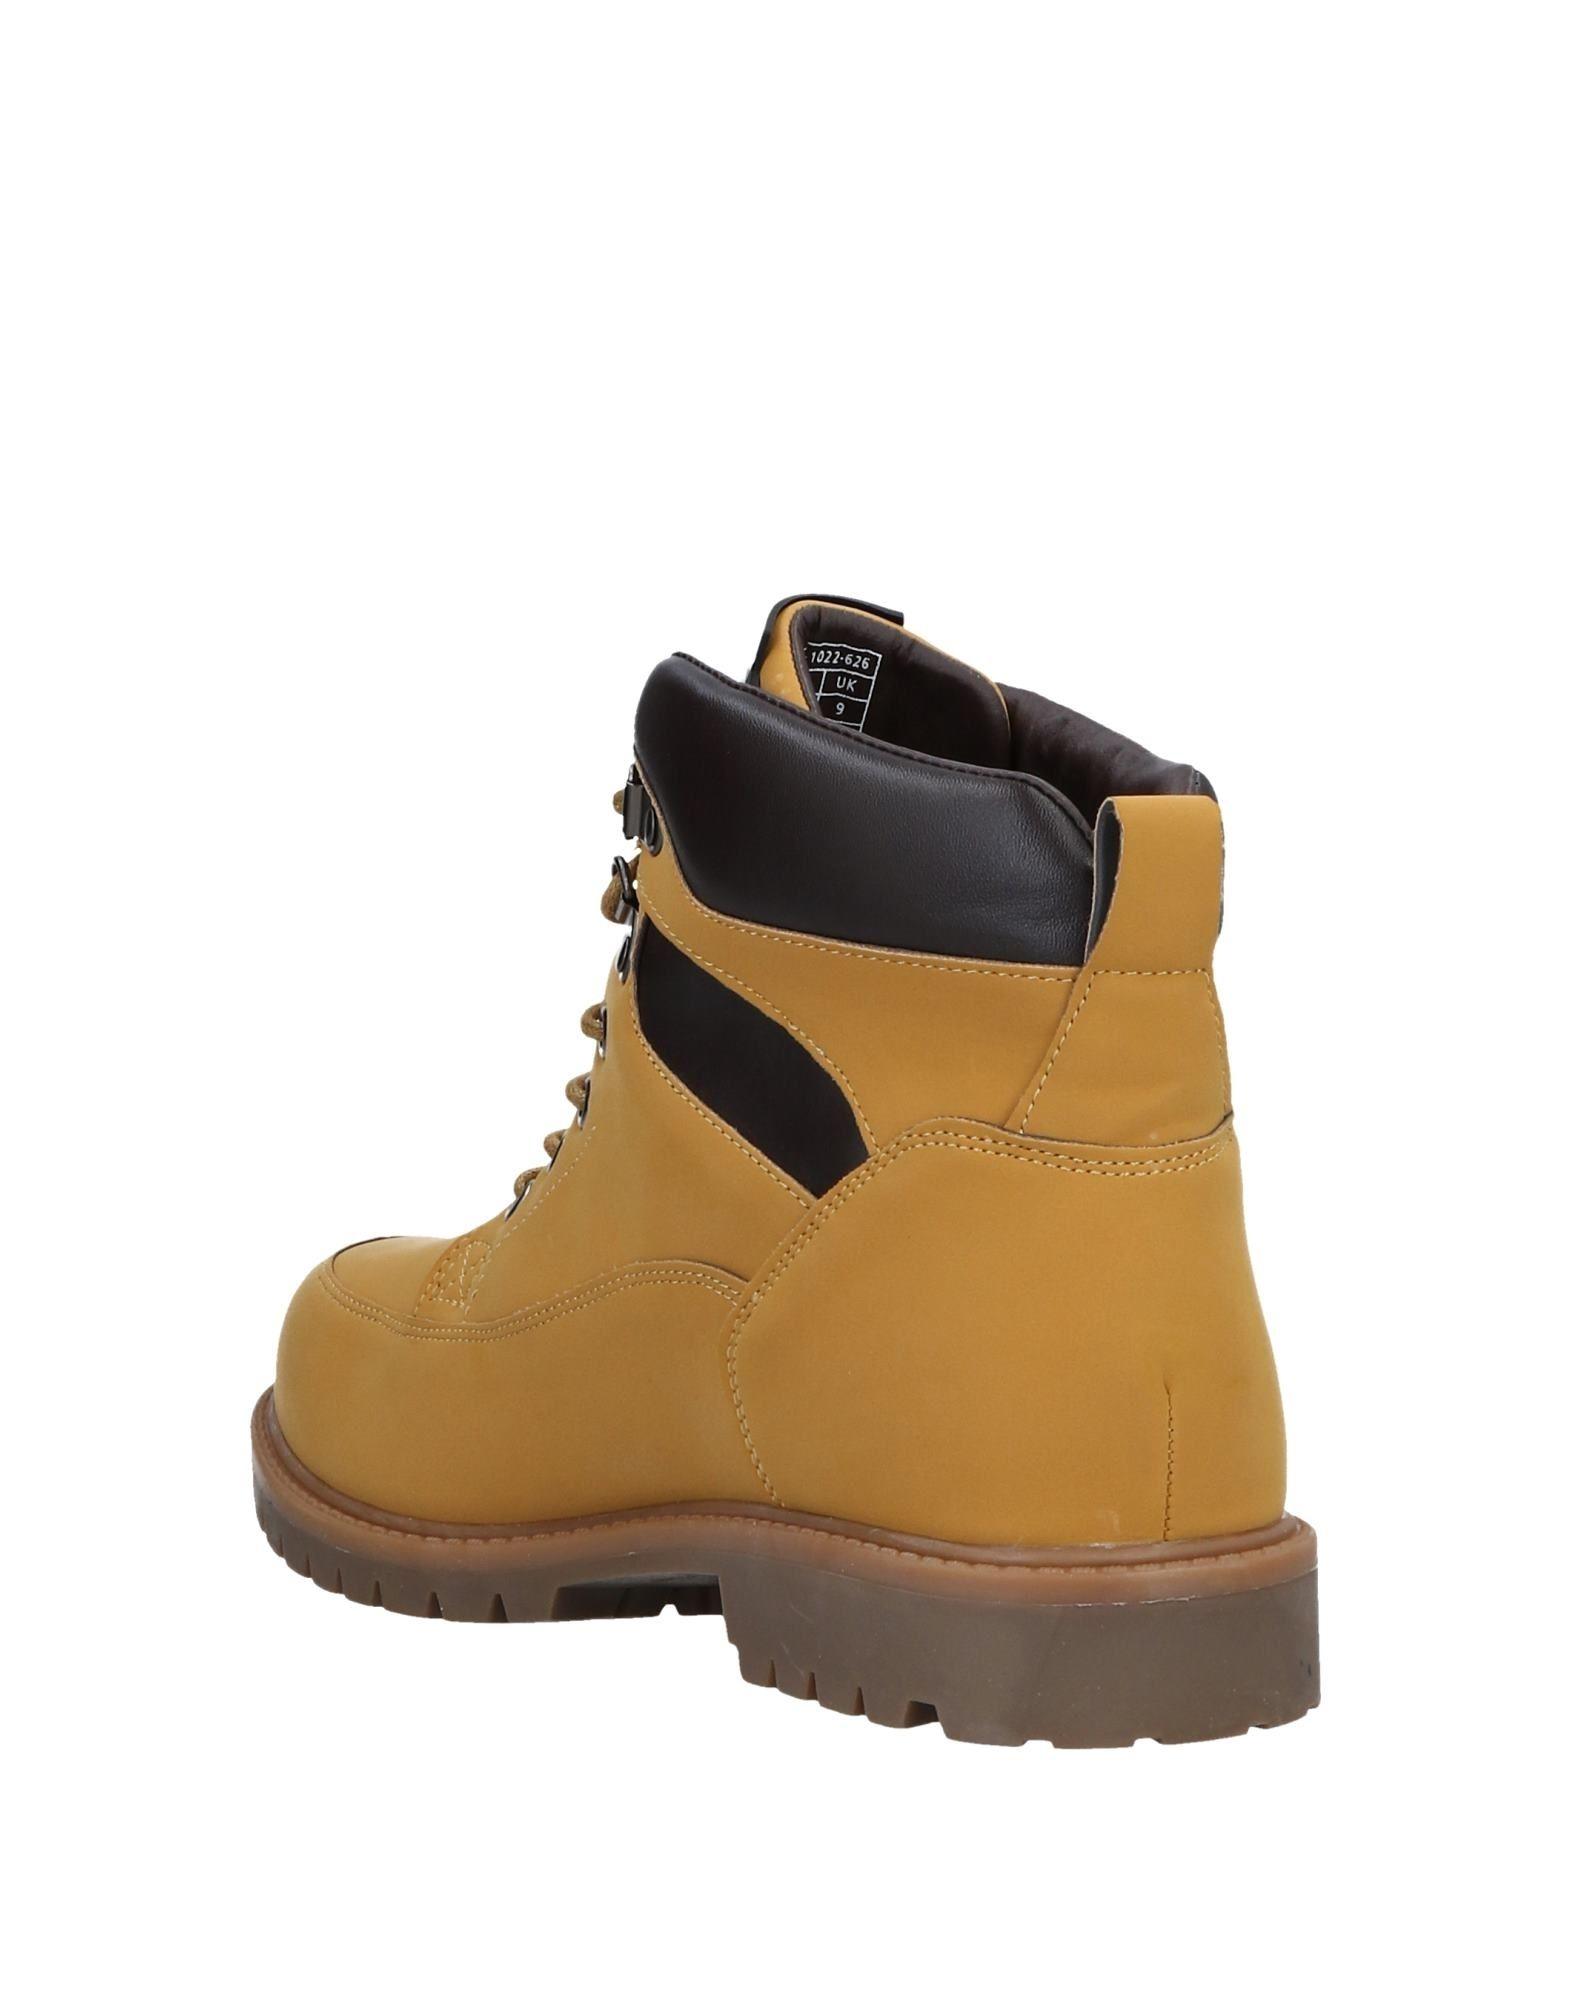 Rabatt echte Schuhe 11520608LX Rifle Stiefelette Herren  11520608LX Schuhe 4512f1